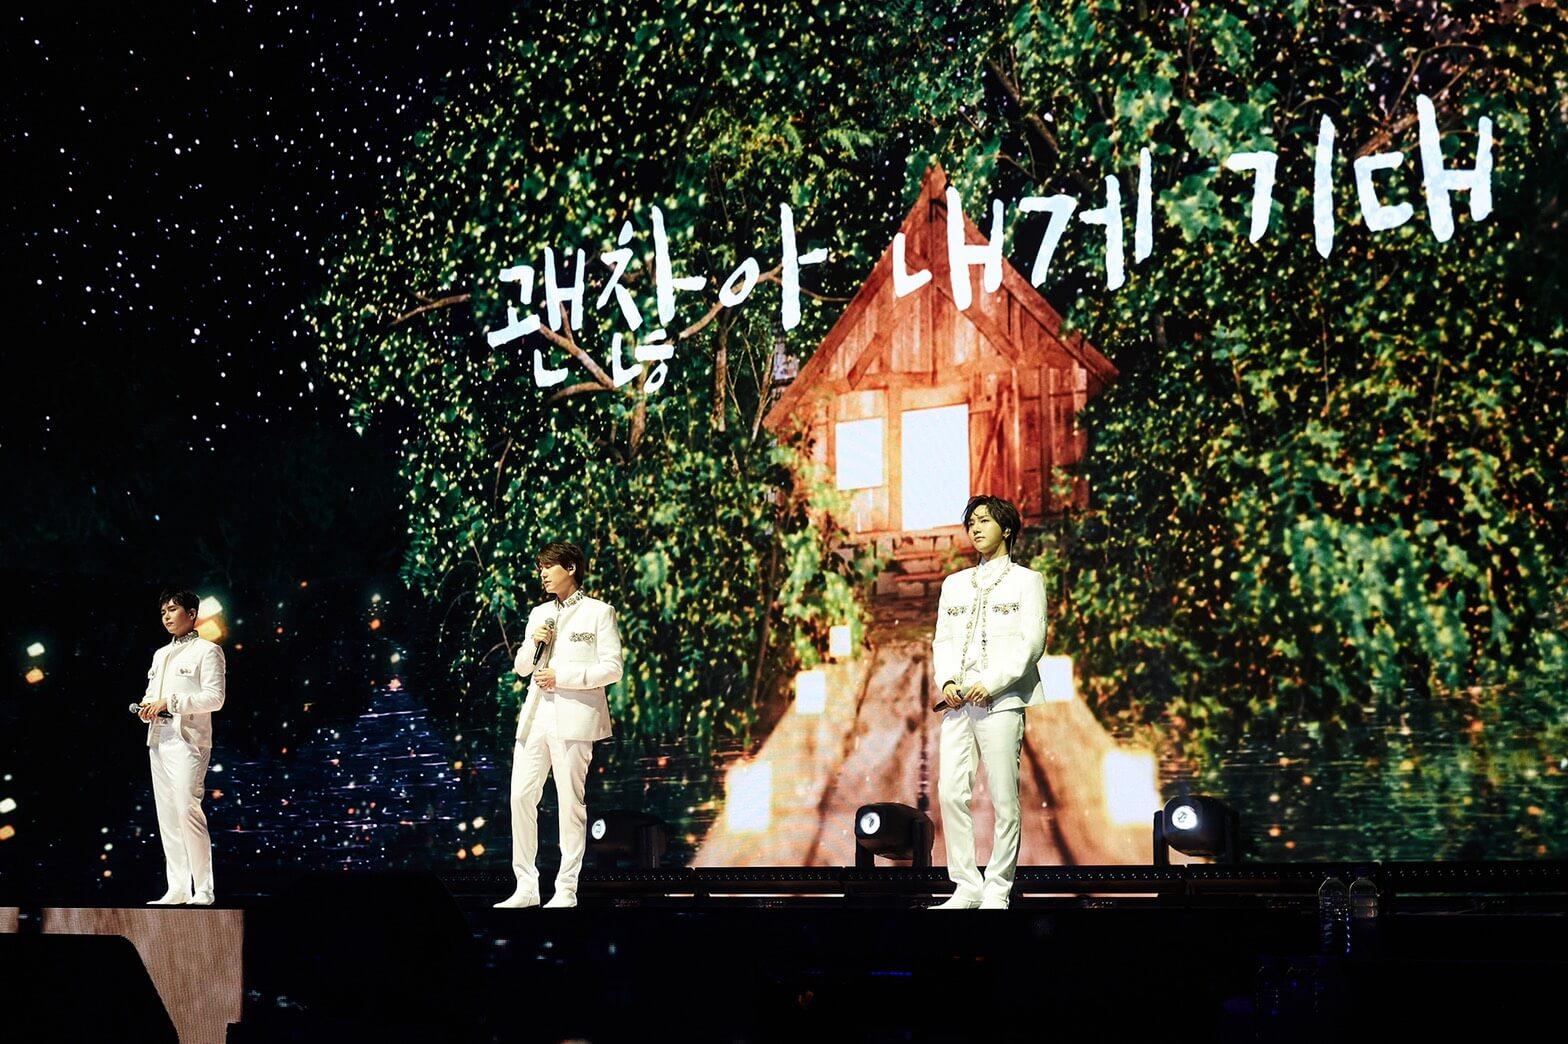 SUPER JUNIOR-K.R.Y.  5年ぶりの単独コンサートを開催サムネイル画像